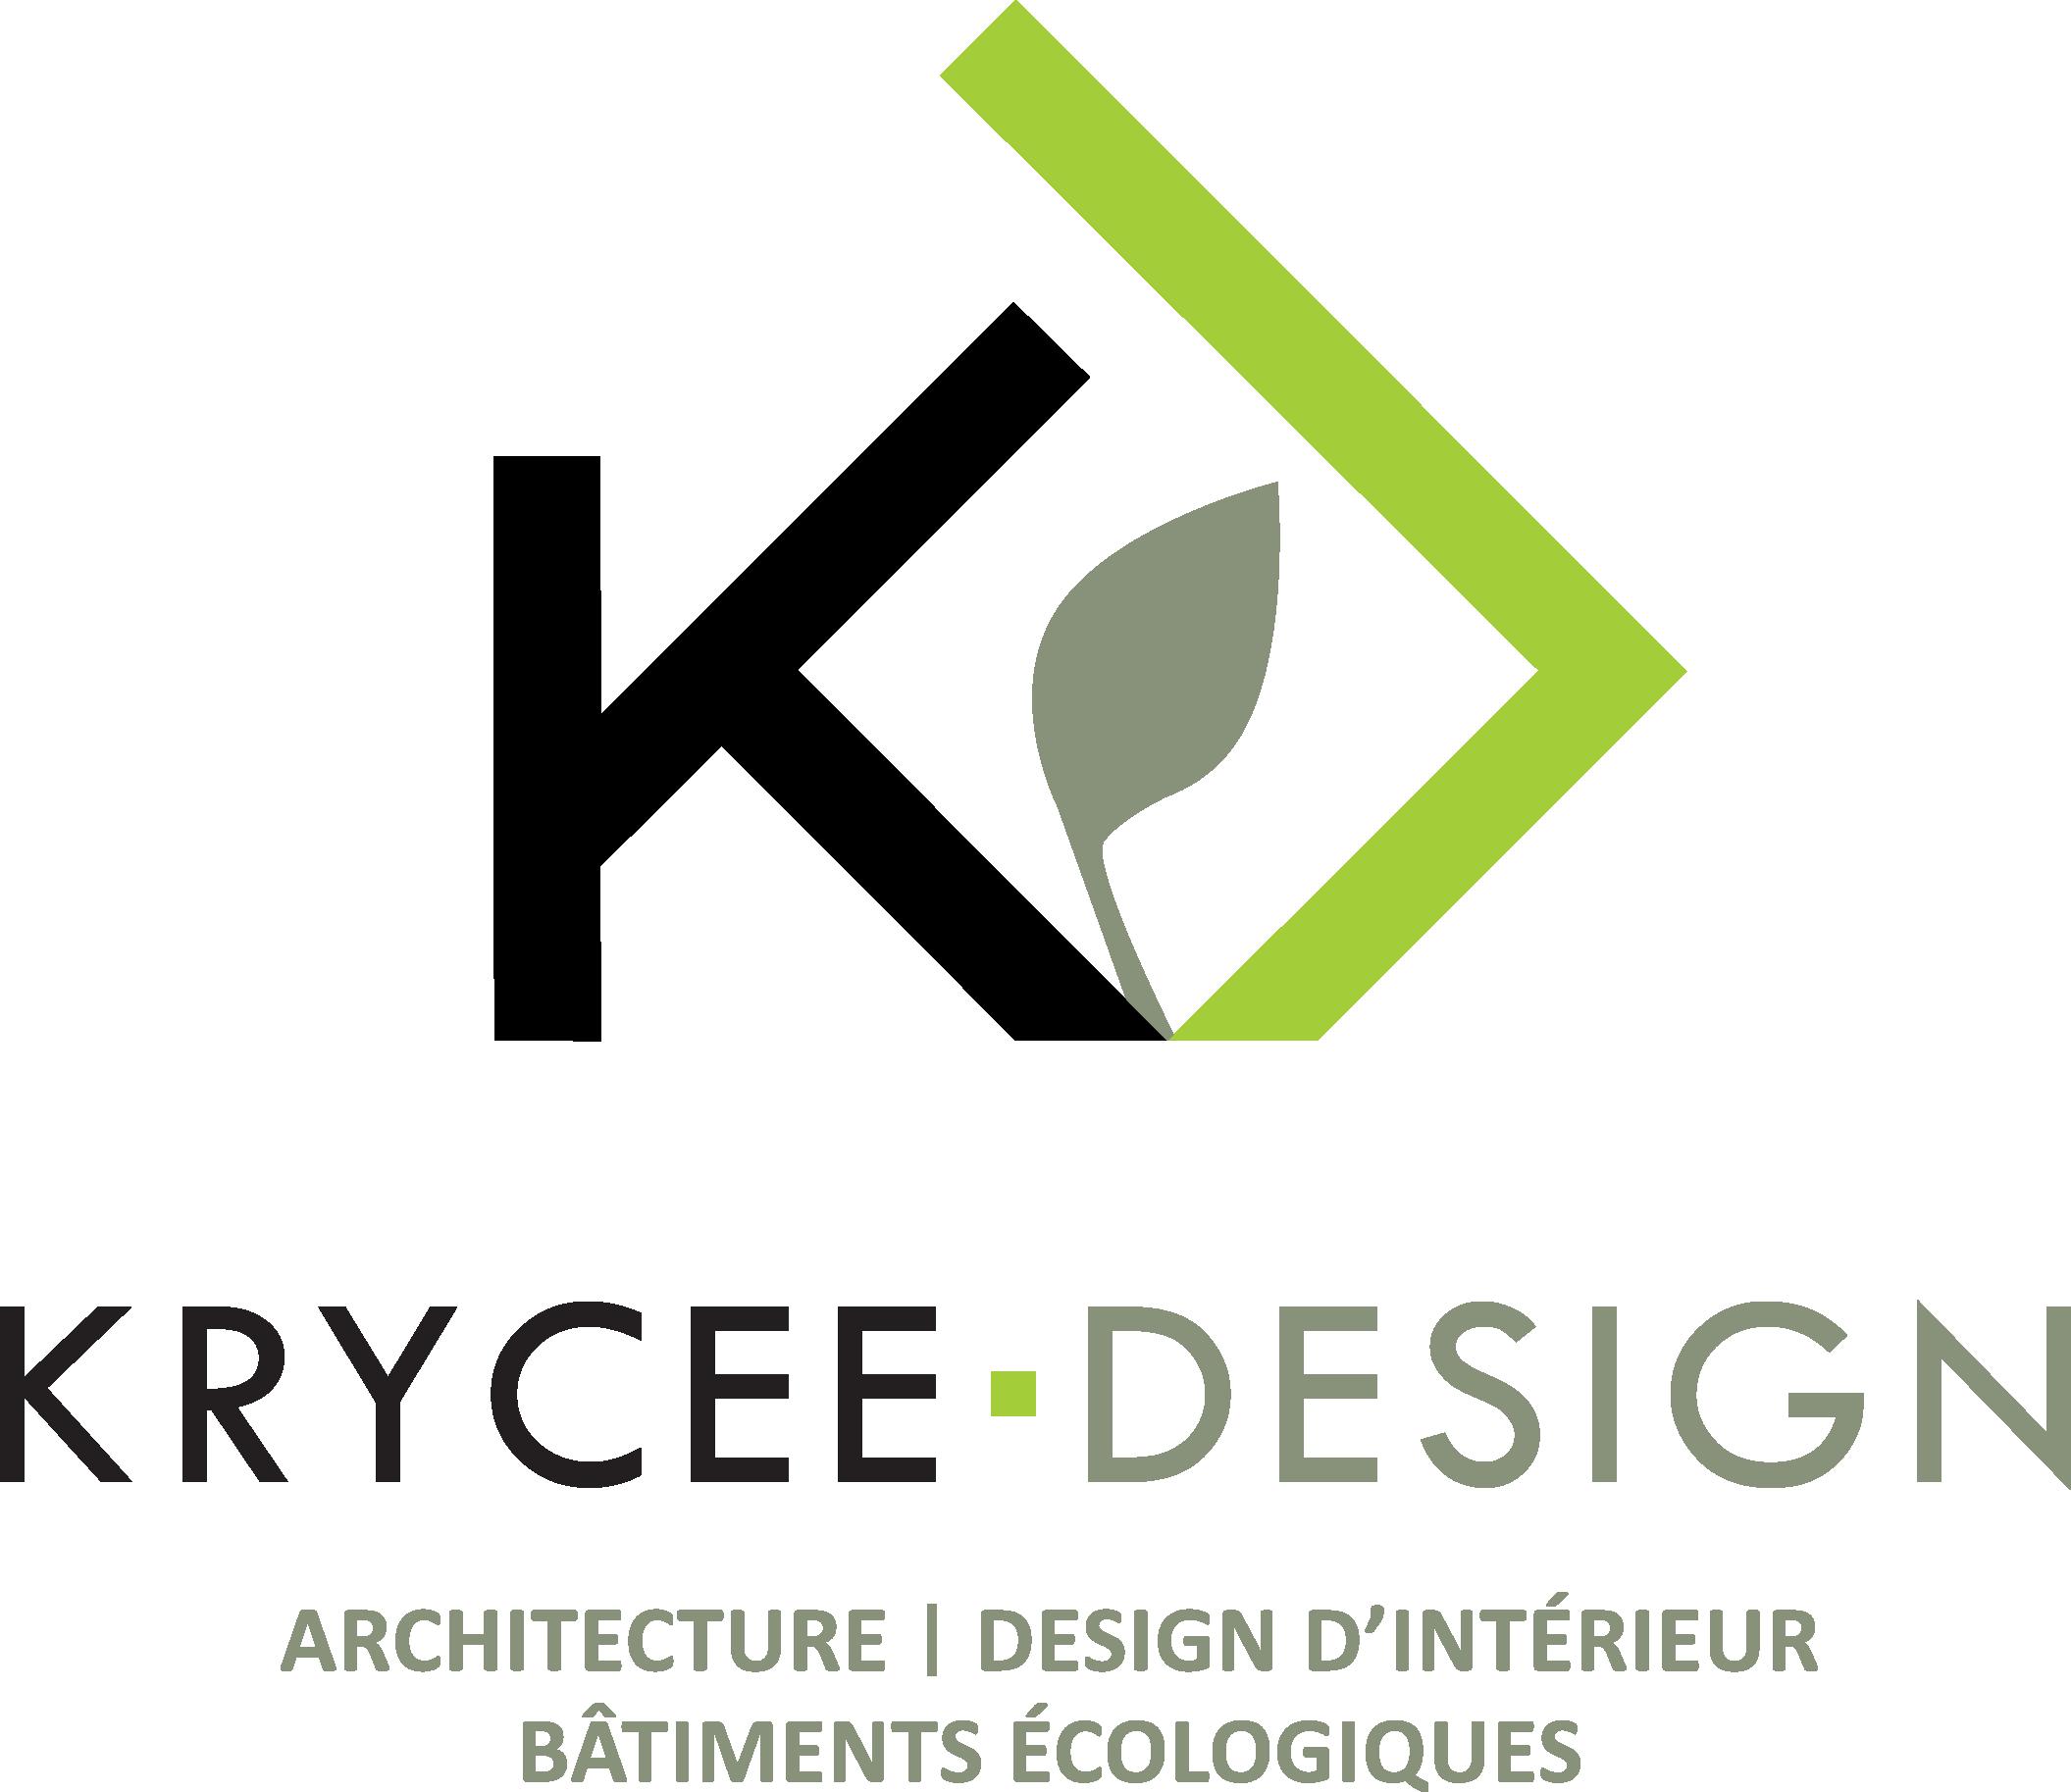 KryceeDesign